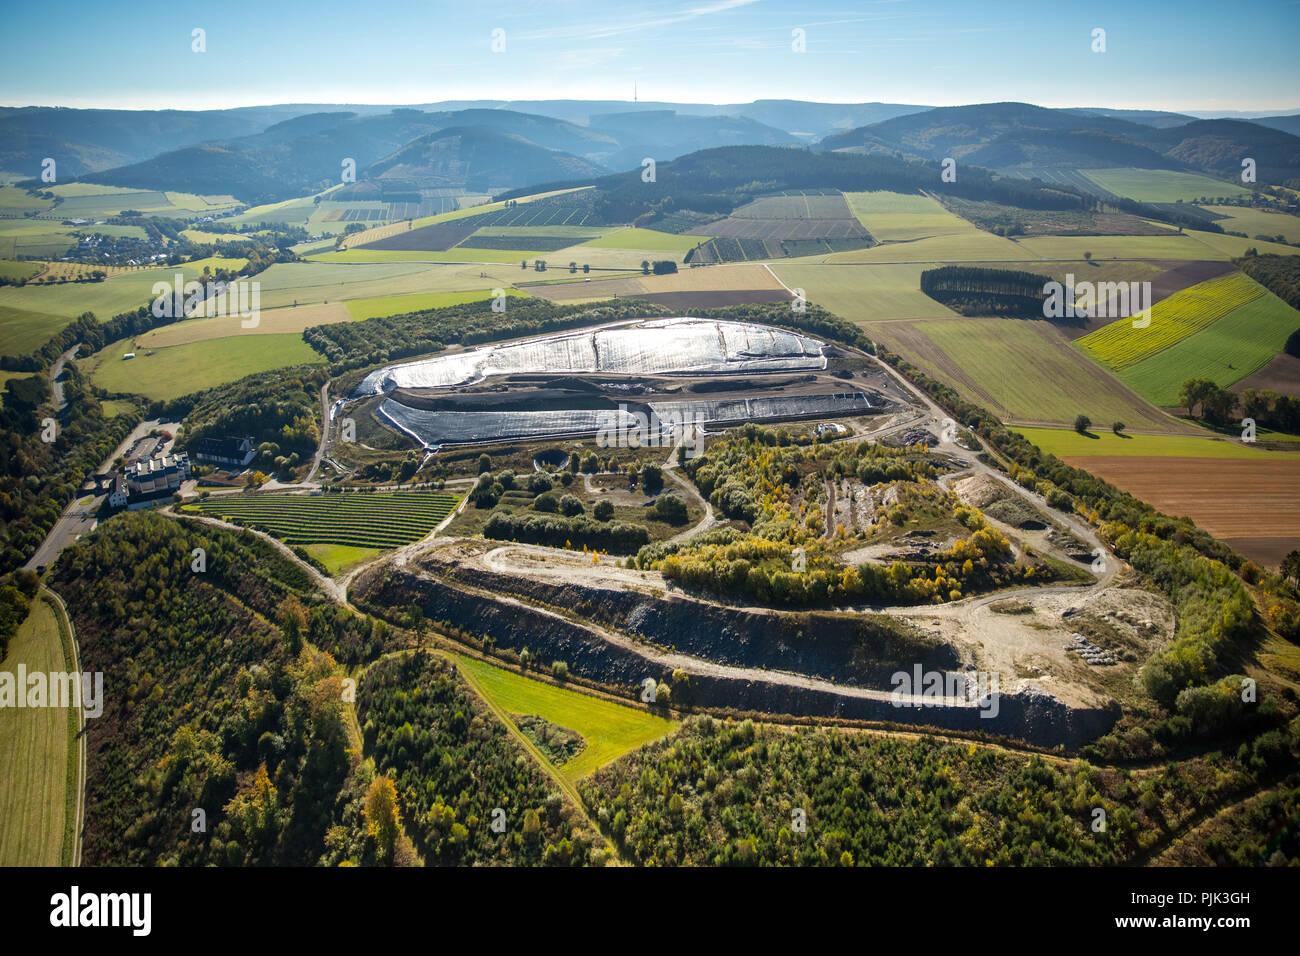 Aerial view, landfill, garbage dump, Frielinghausen, Meschede, Sauerland, North Rhine-Westphalia, Germany - Stock Image